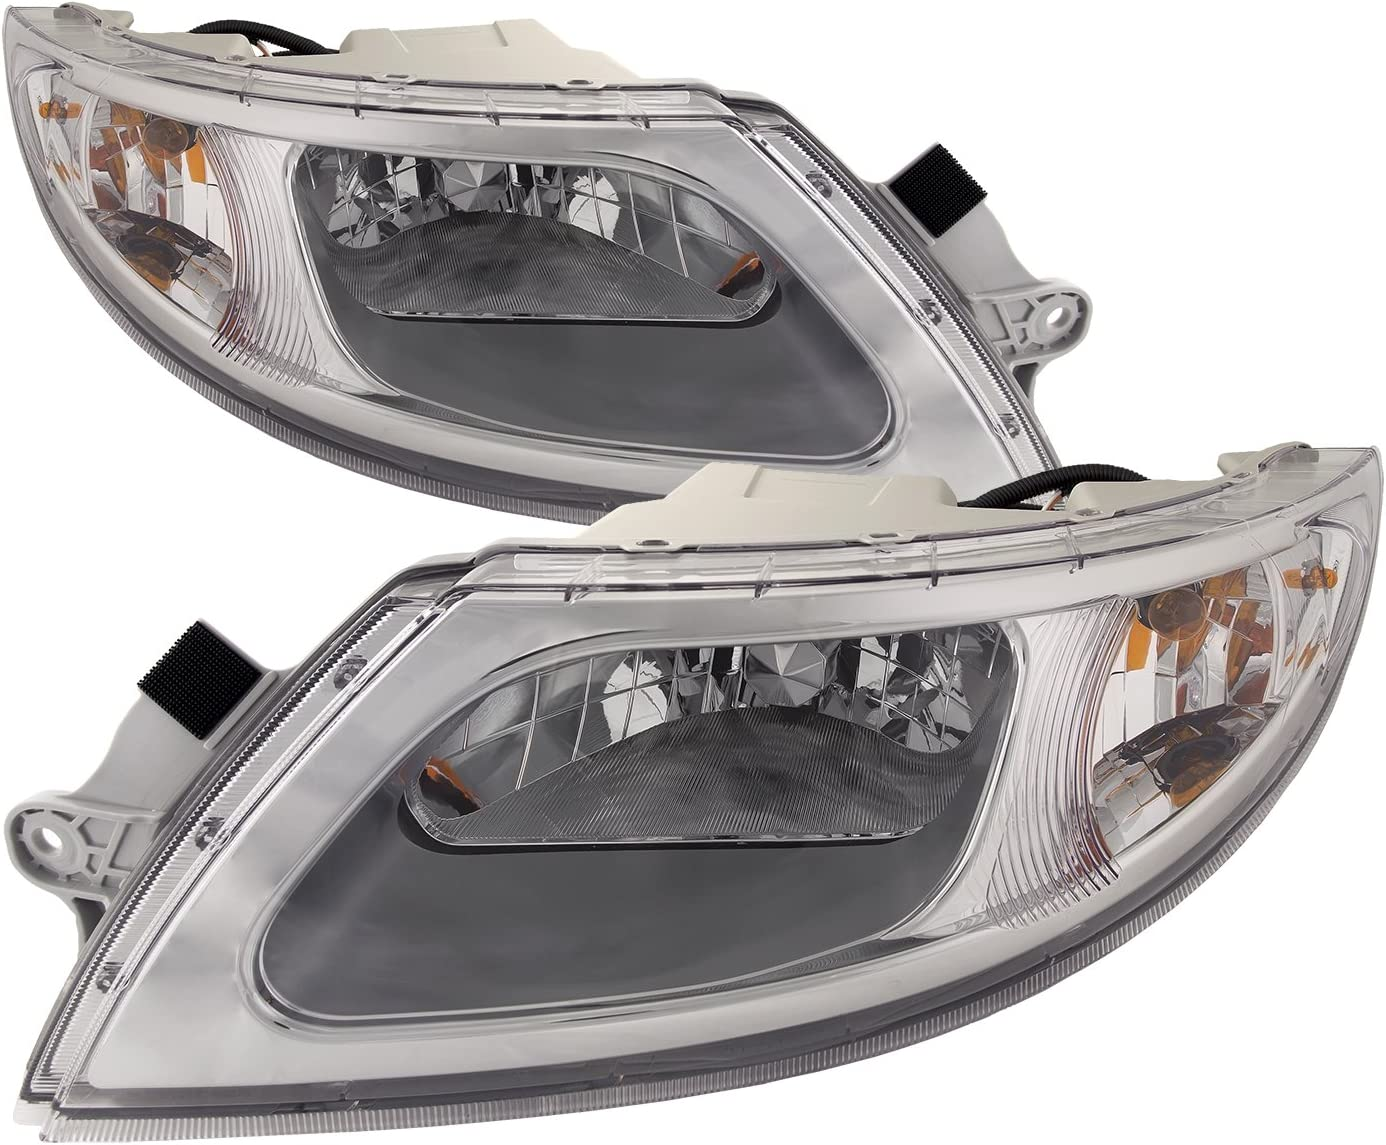 HEADLIGHTSDEPOT Chrome Housing Halogen Headlights Set Compatible with International Harvester 4100 4200 4300 4400 8500 TranStar 8600 Includes Left Driver Right Passenger Pair